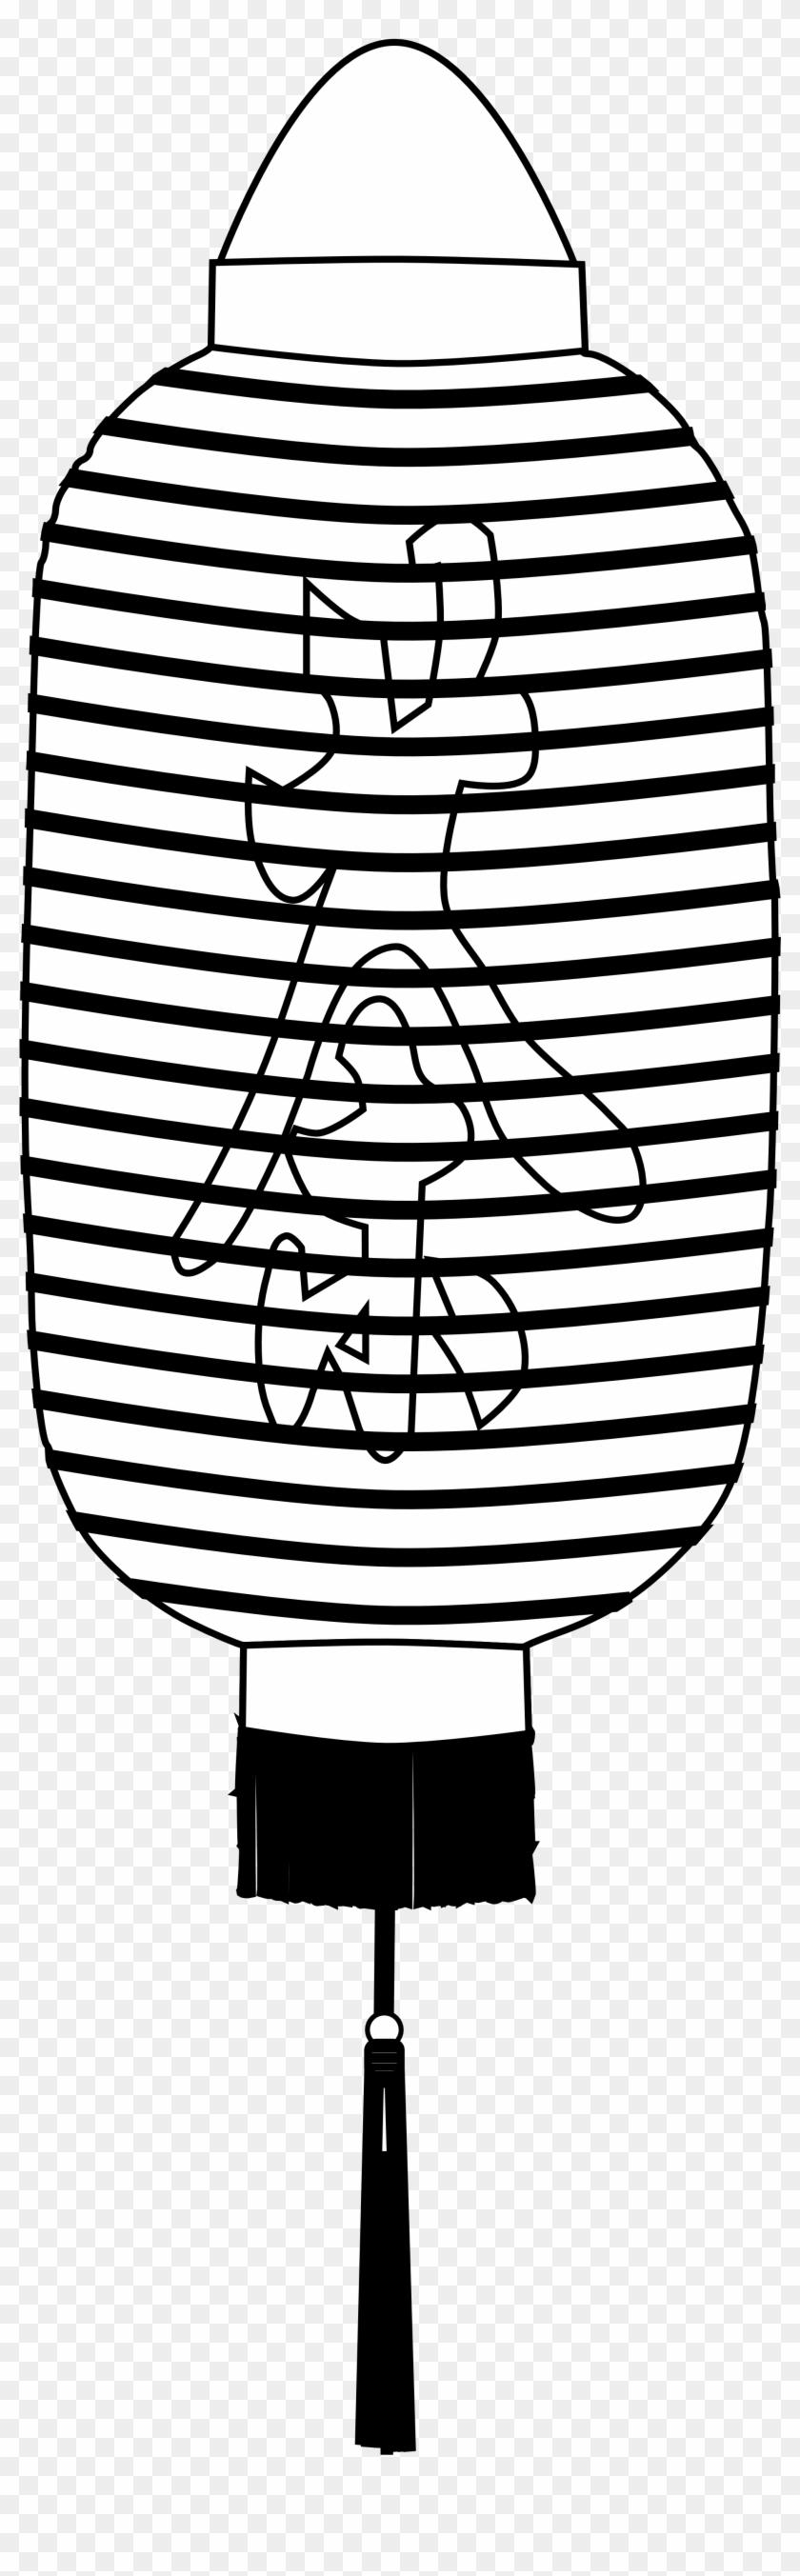 Chinese Lantern Chinese Lantern Black White Line Chinese - Chinese Lantern Chinese Lantern Black White Line Chinese #32530